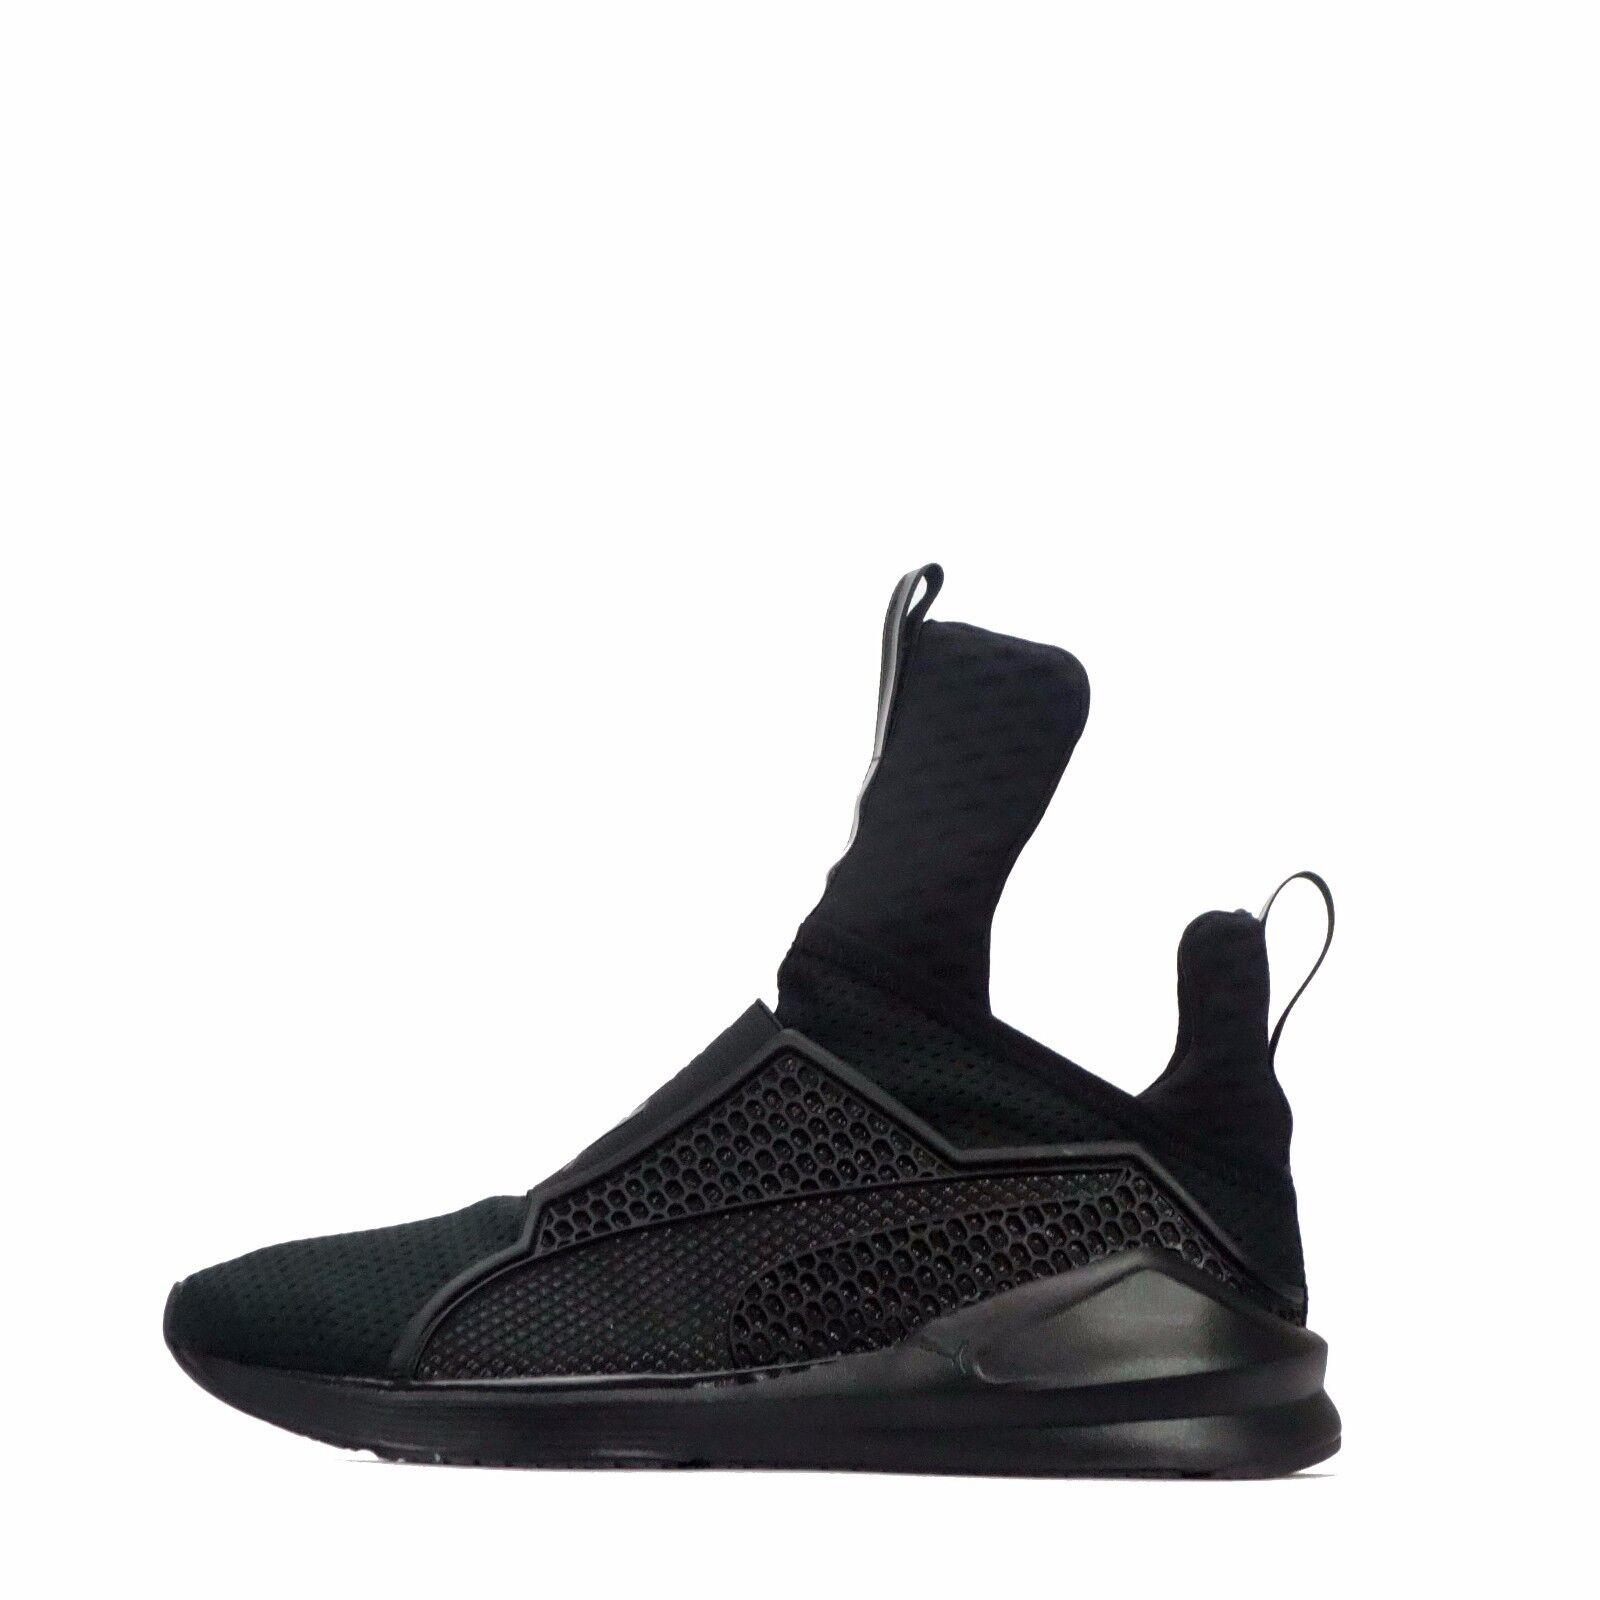 Puma Fenty The Trainer Women's Shoes Black/Black